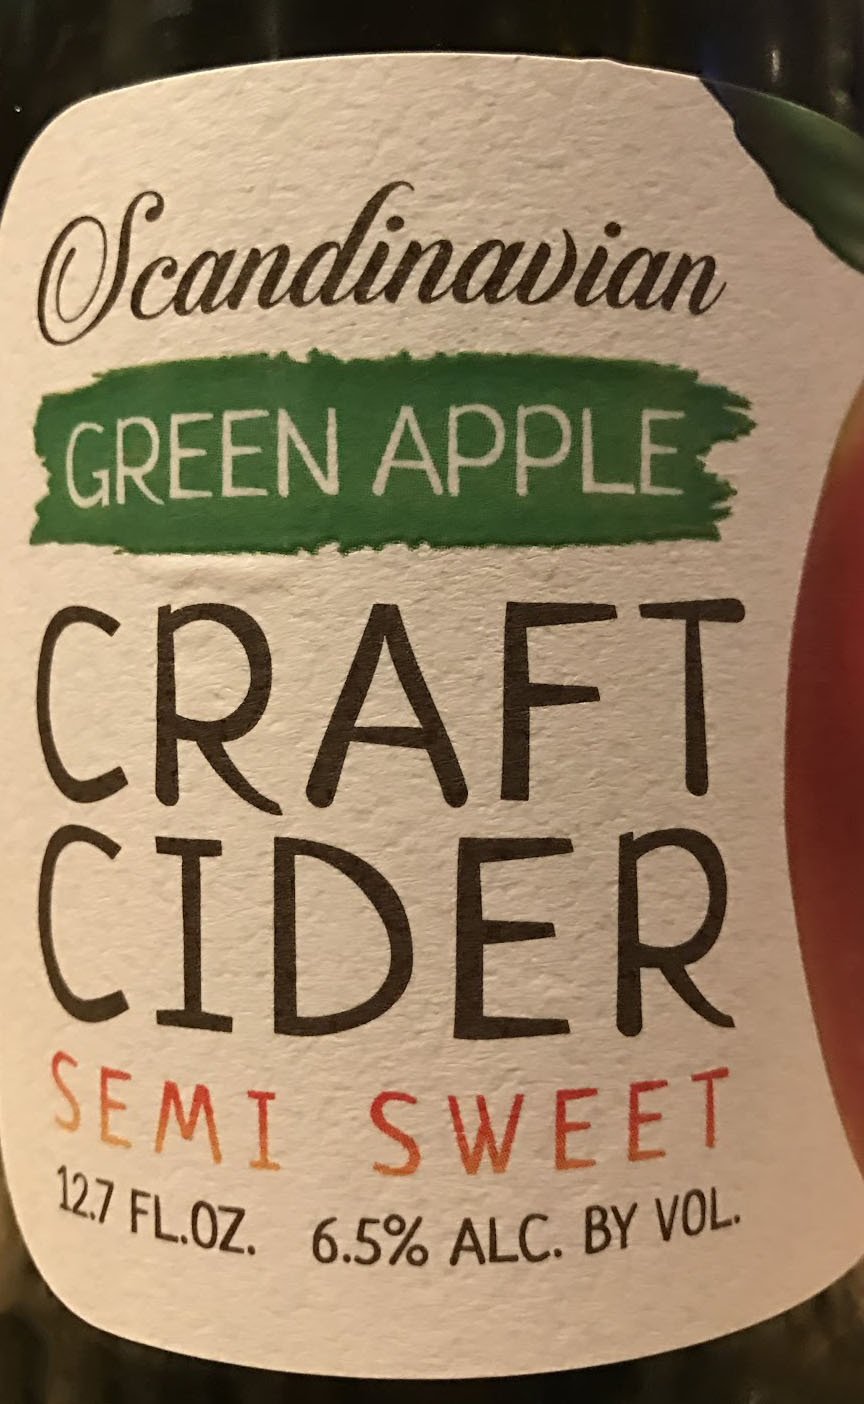 Semi Sweet Cider